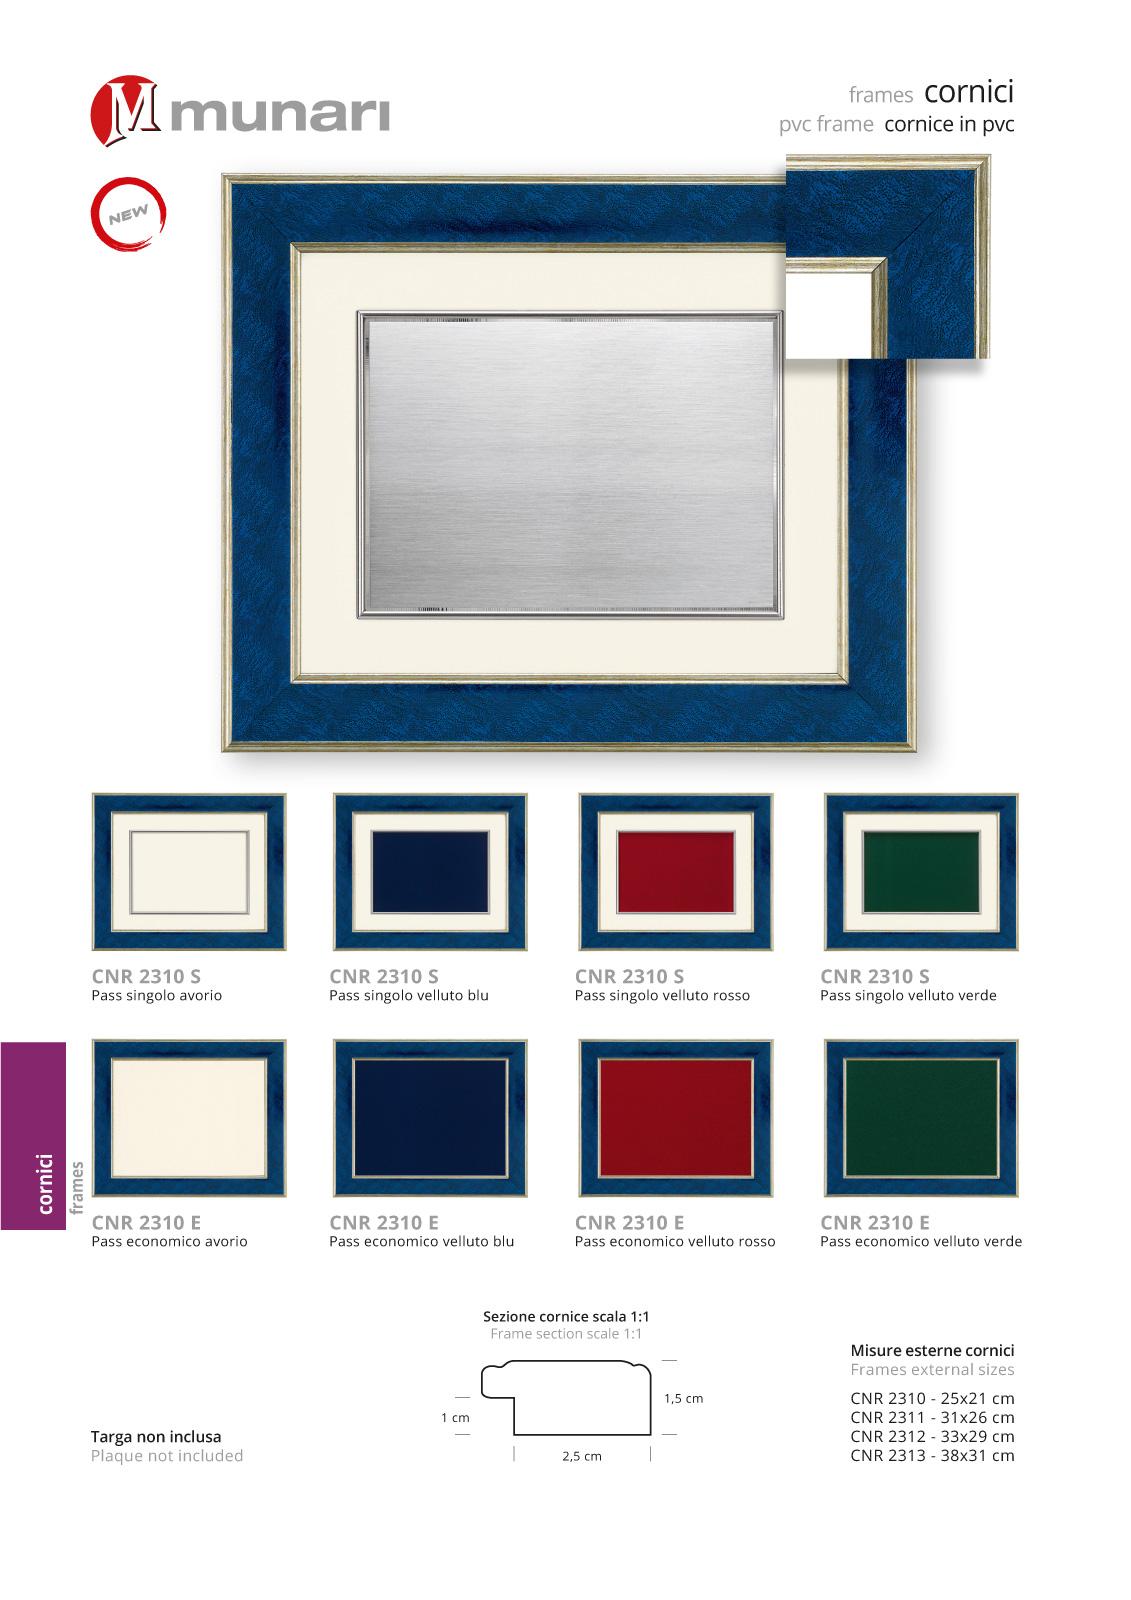 PVC frames series CNR 2310